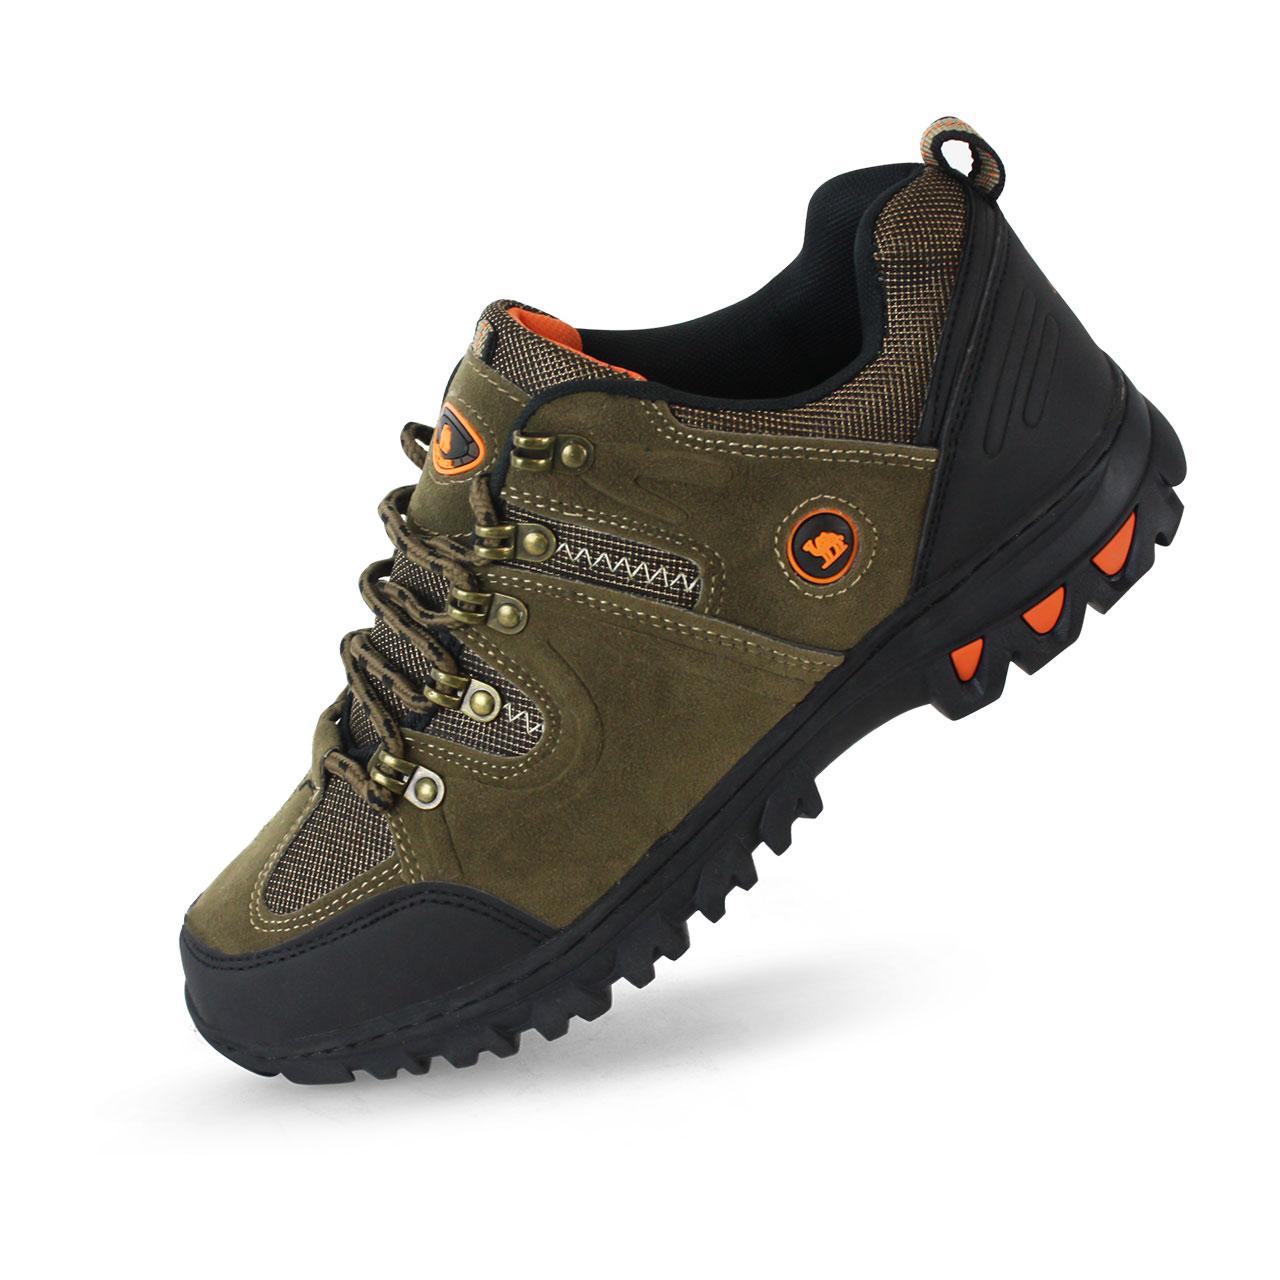 Men's Peanut Brown Athletic Suede Outdoor Shoes